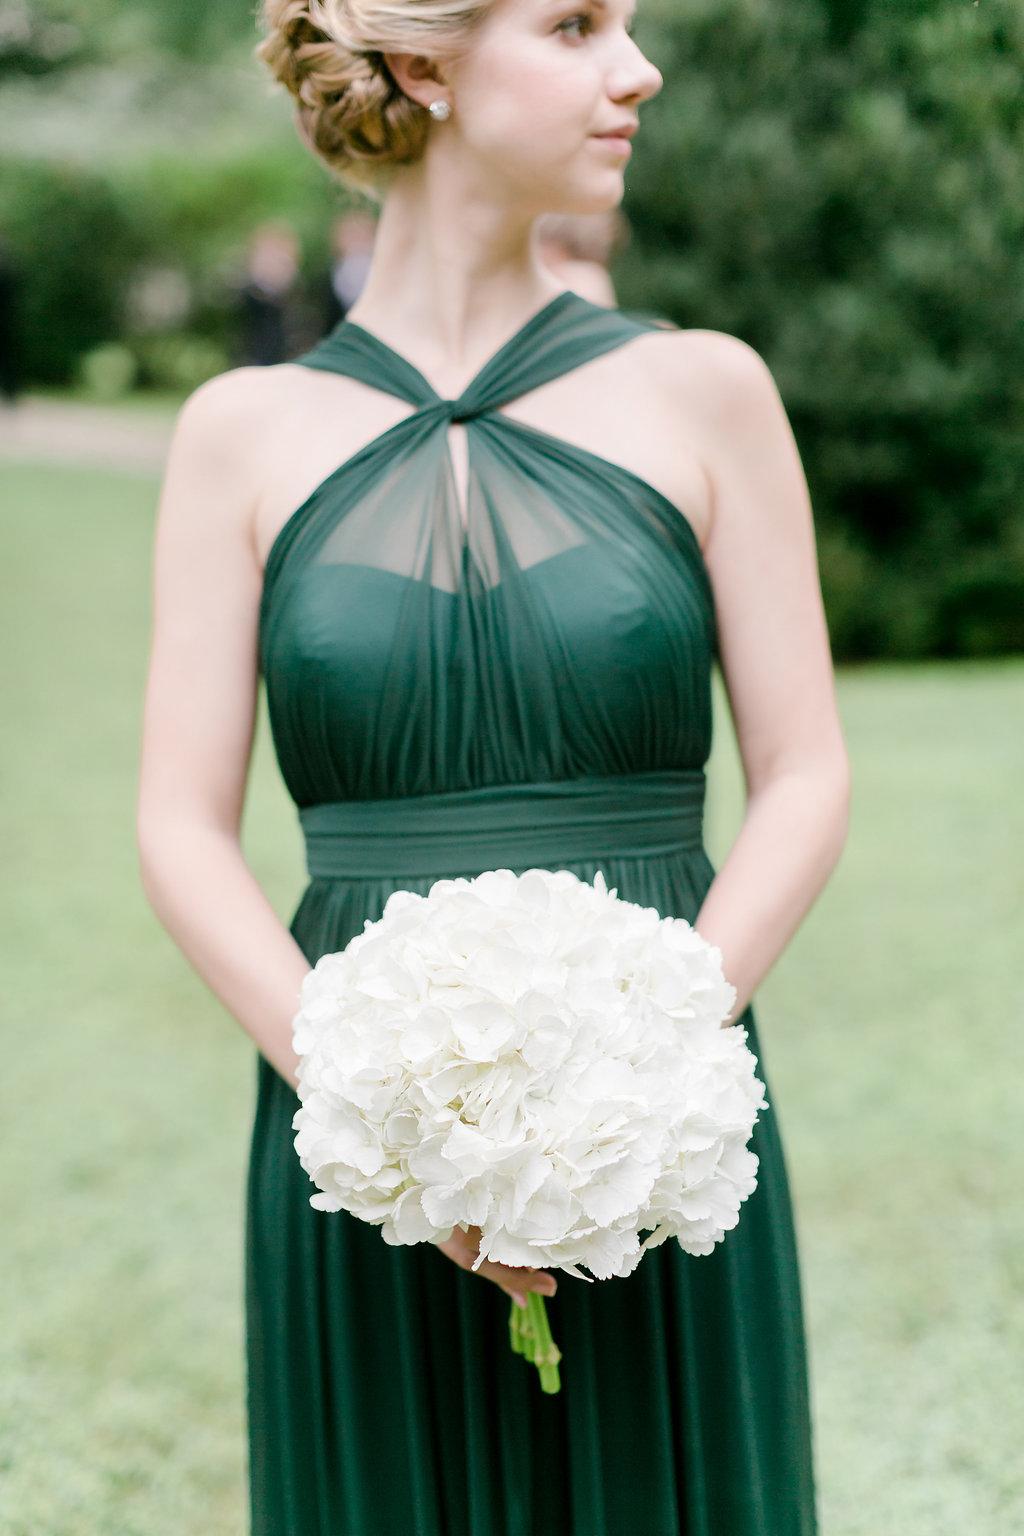 A Classic Rust Manor House Virginia Wedding - The Overwhelmed Bride Wedding Blog